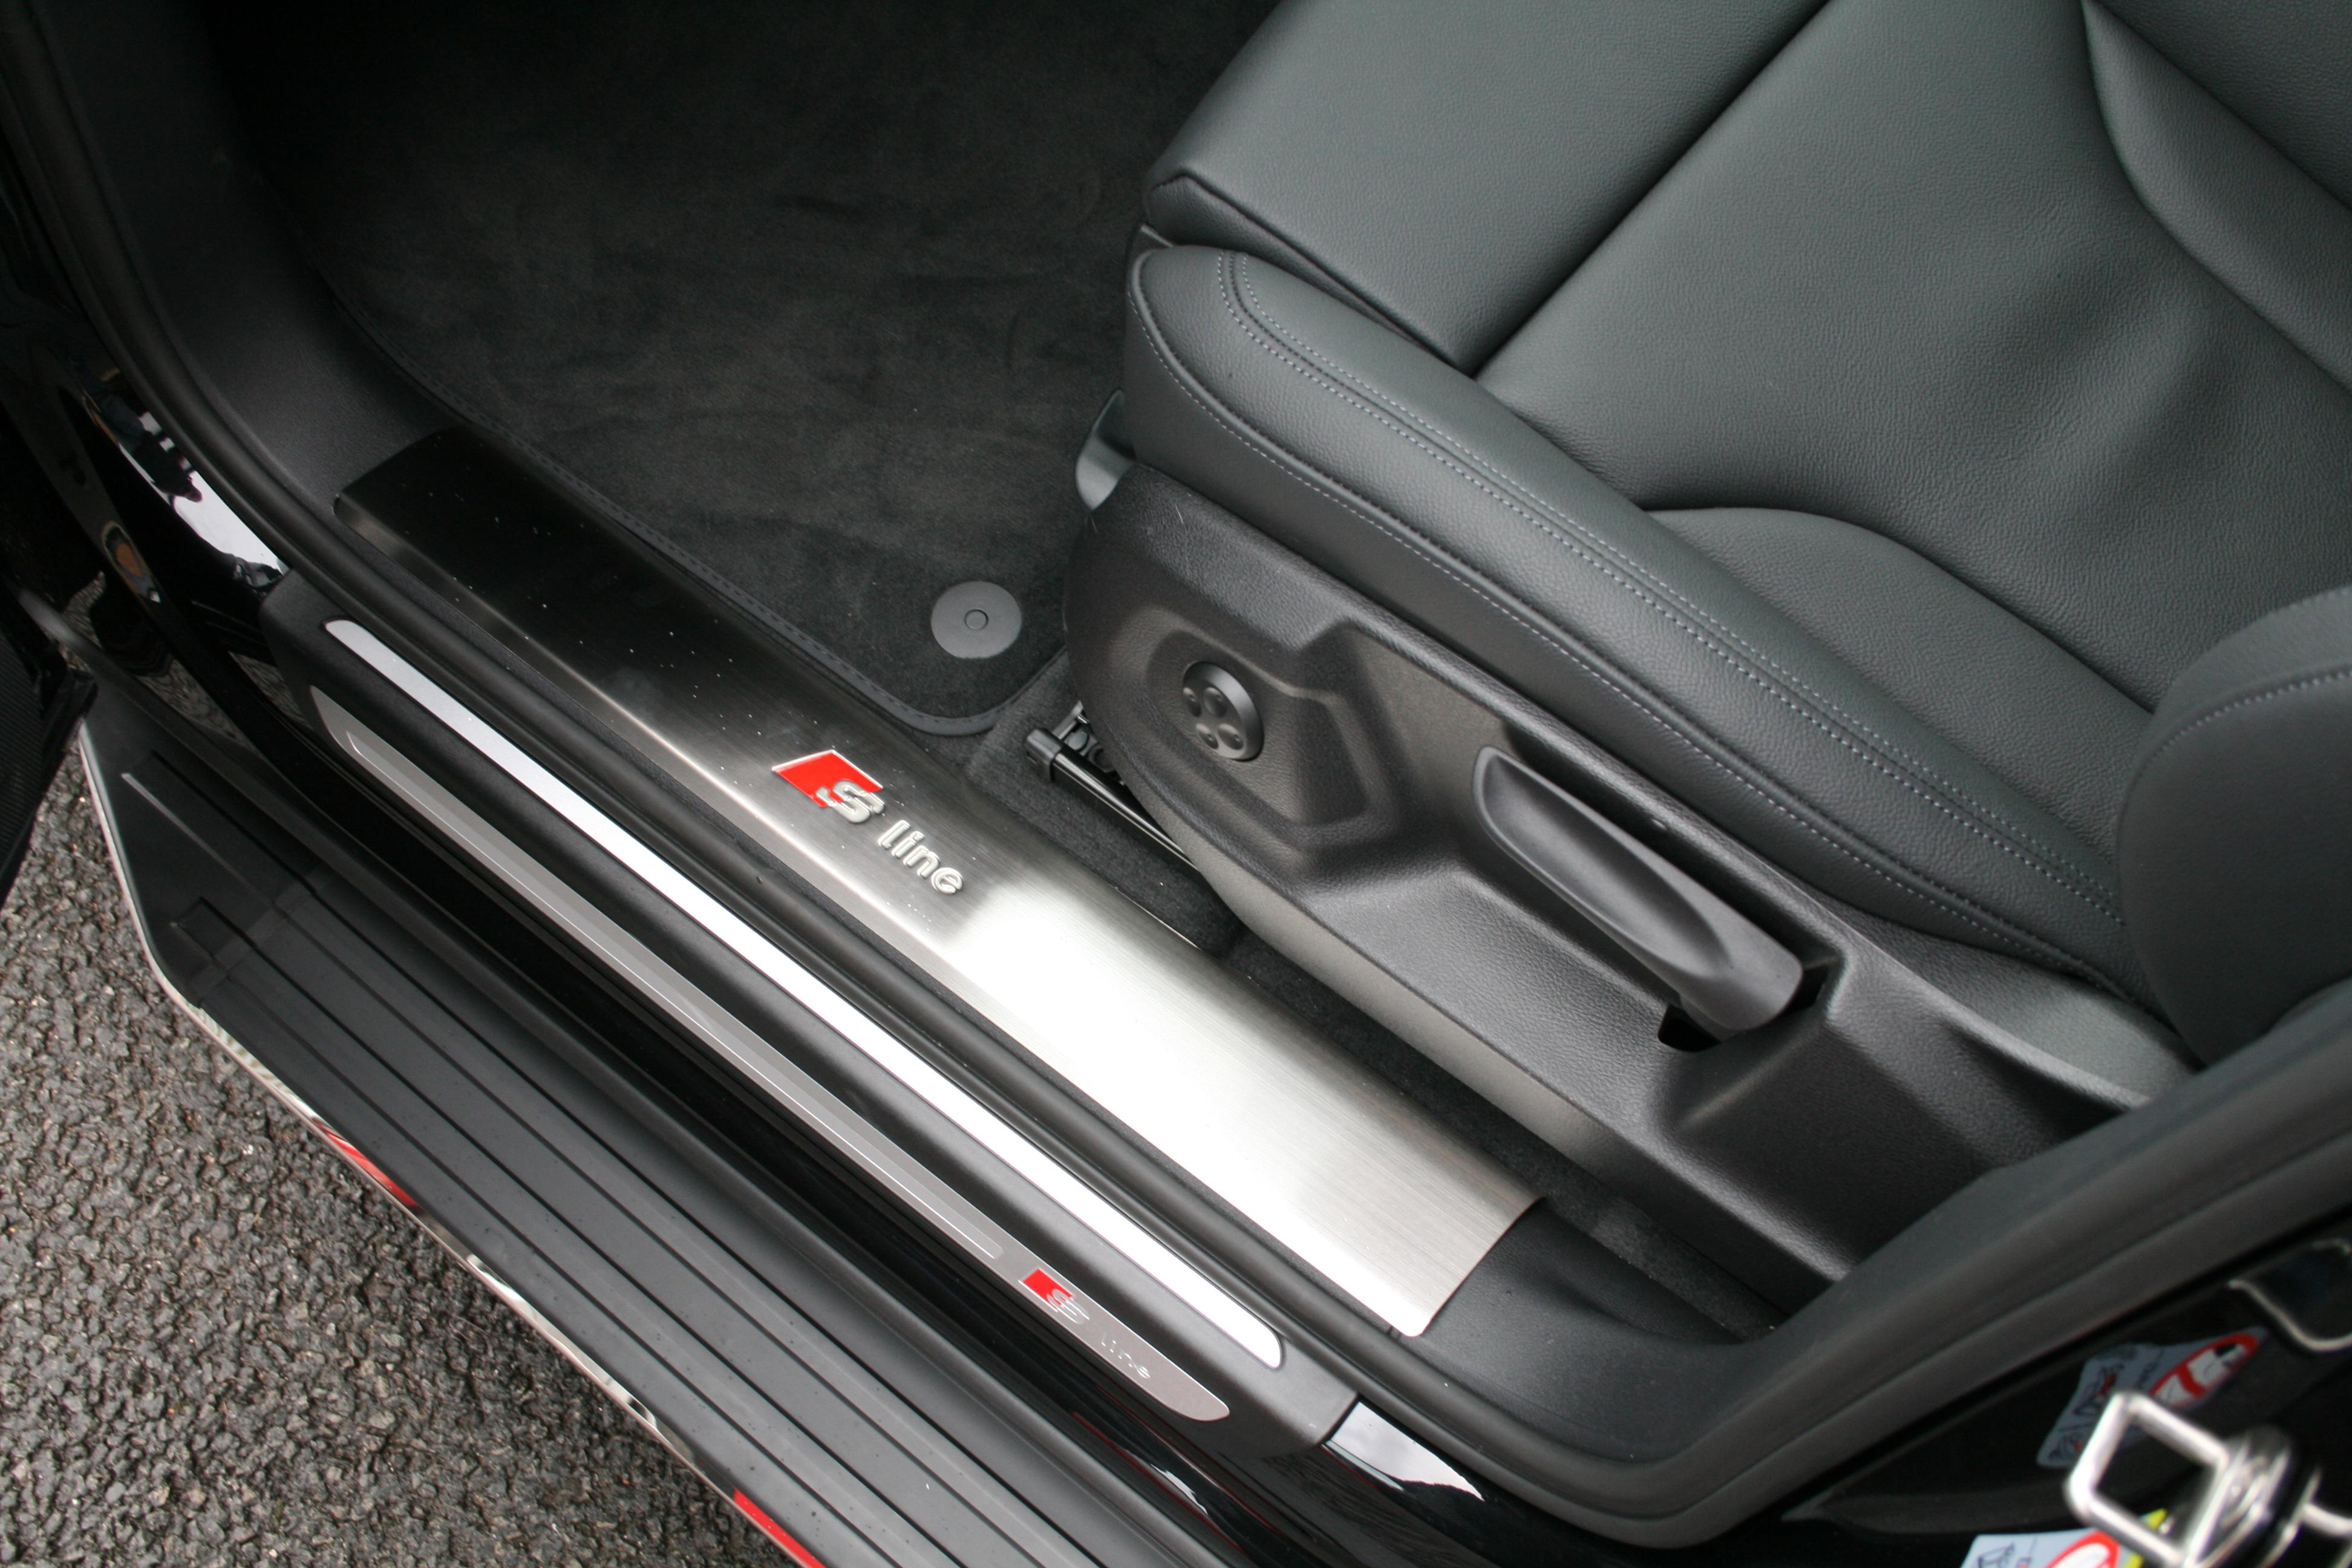 Audi Q5 S Line Style Door Sill Covers Protectors Scuff